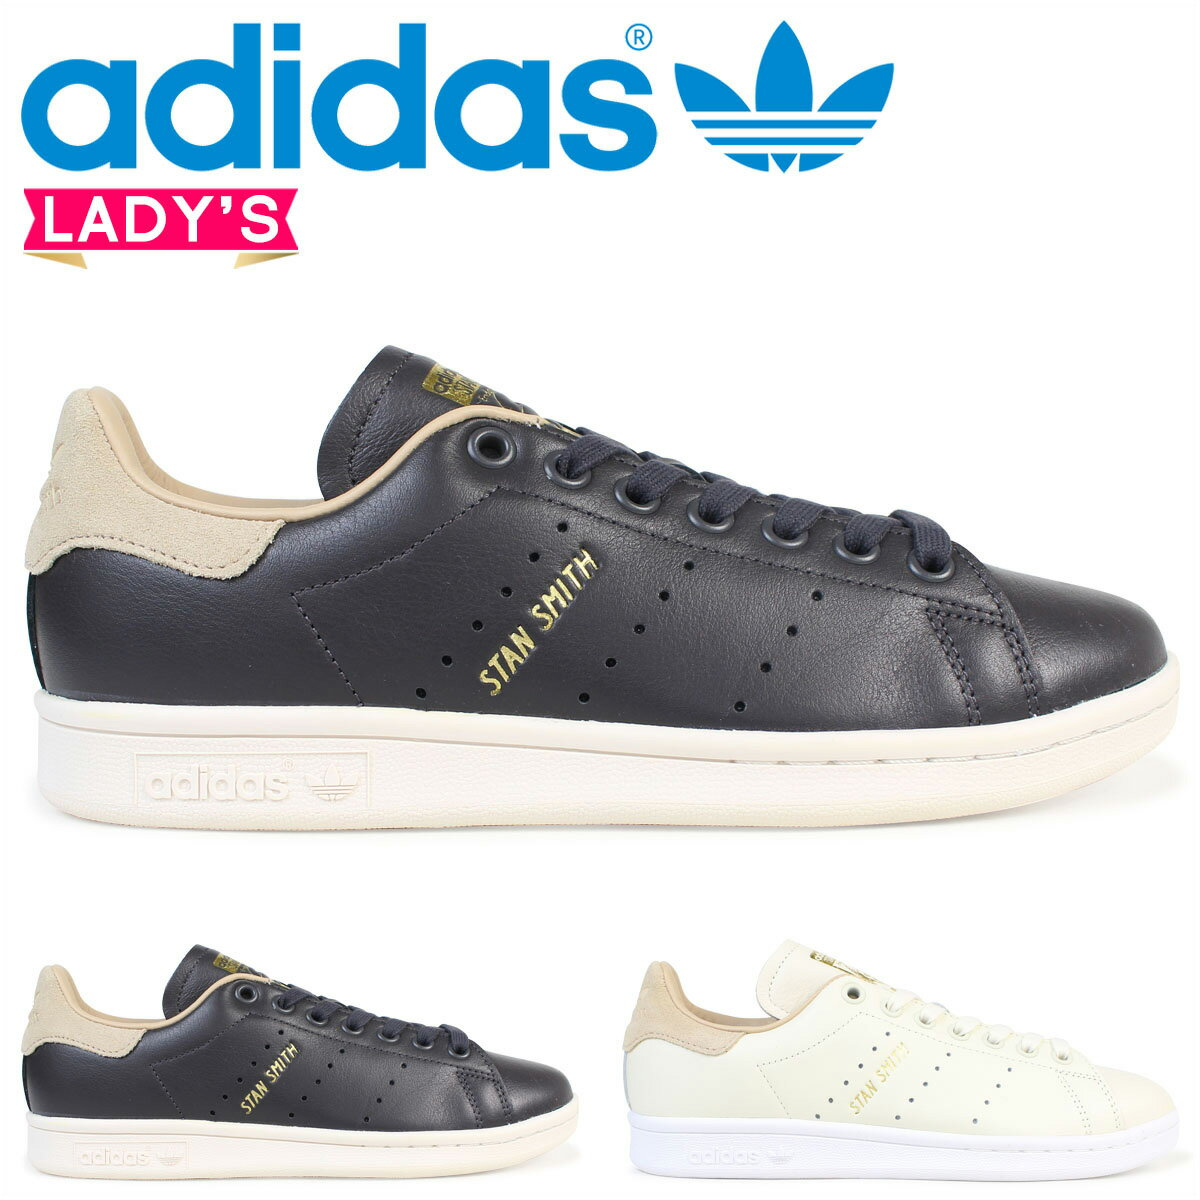 adidas スタンスミス レディース アディダス Originals スニーカー STAN SMITH W BB5164 BB5165 靴 オリジナルス